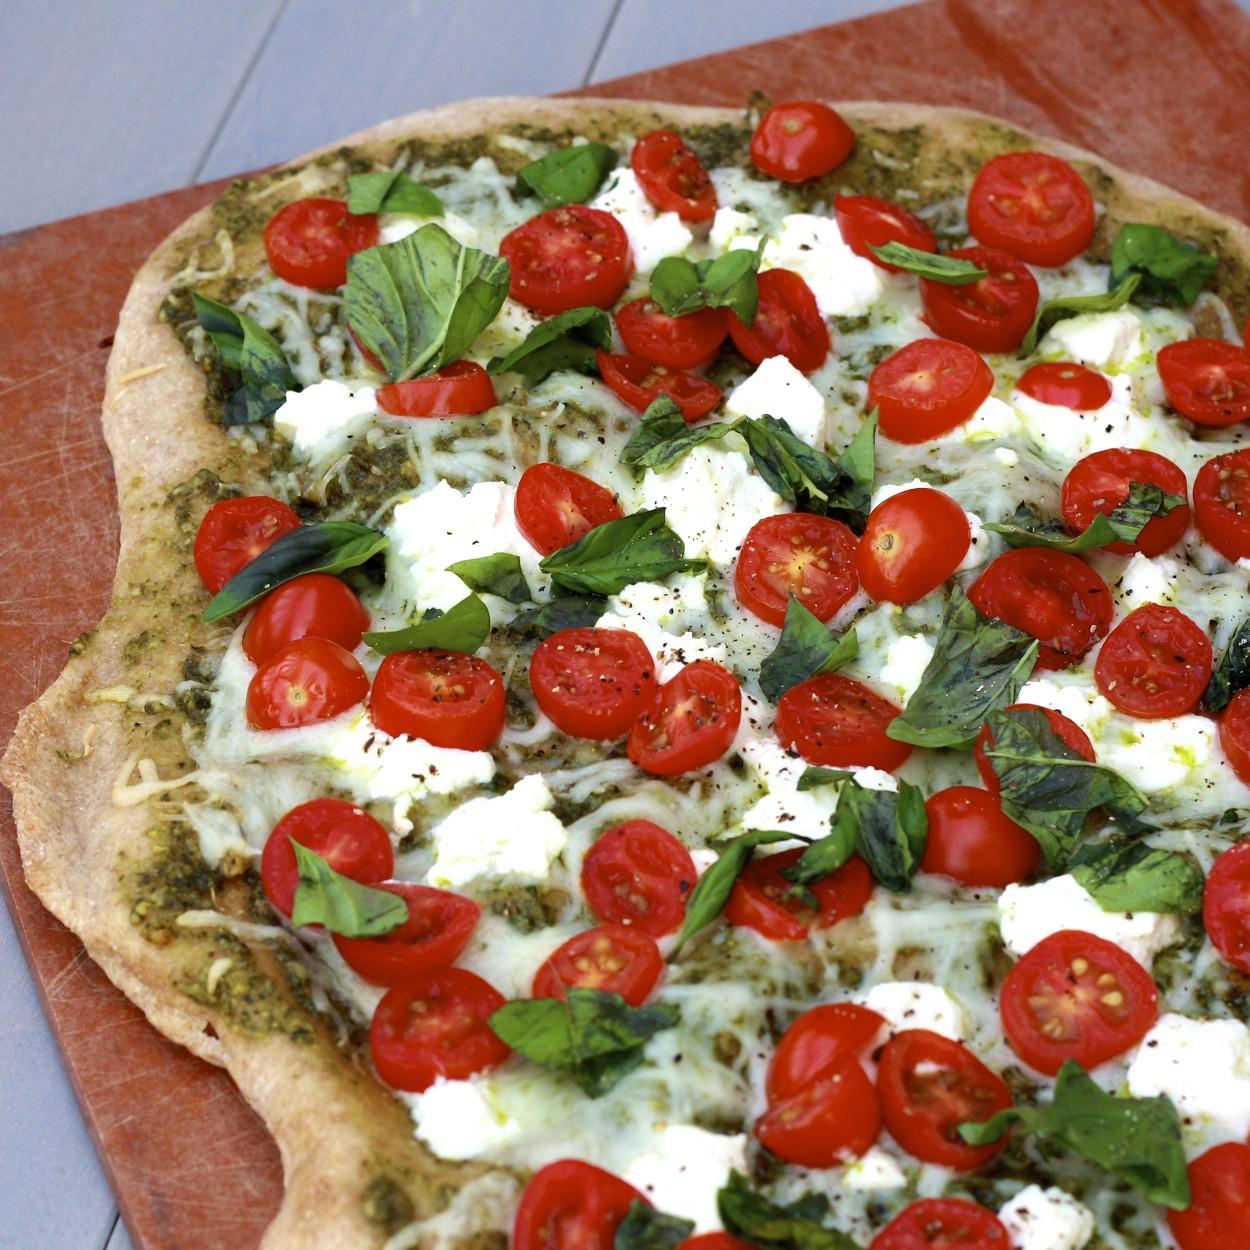 White Pesto Pizza with Tomatoes & Basil